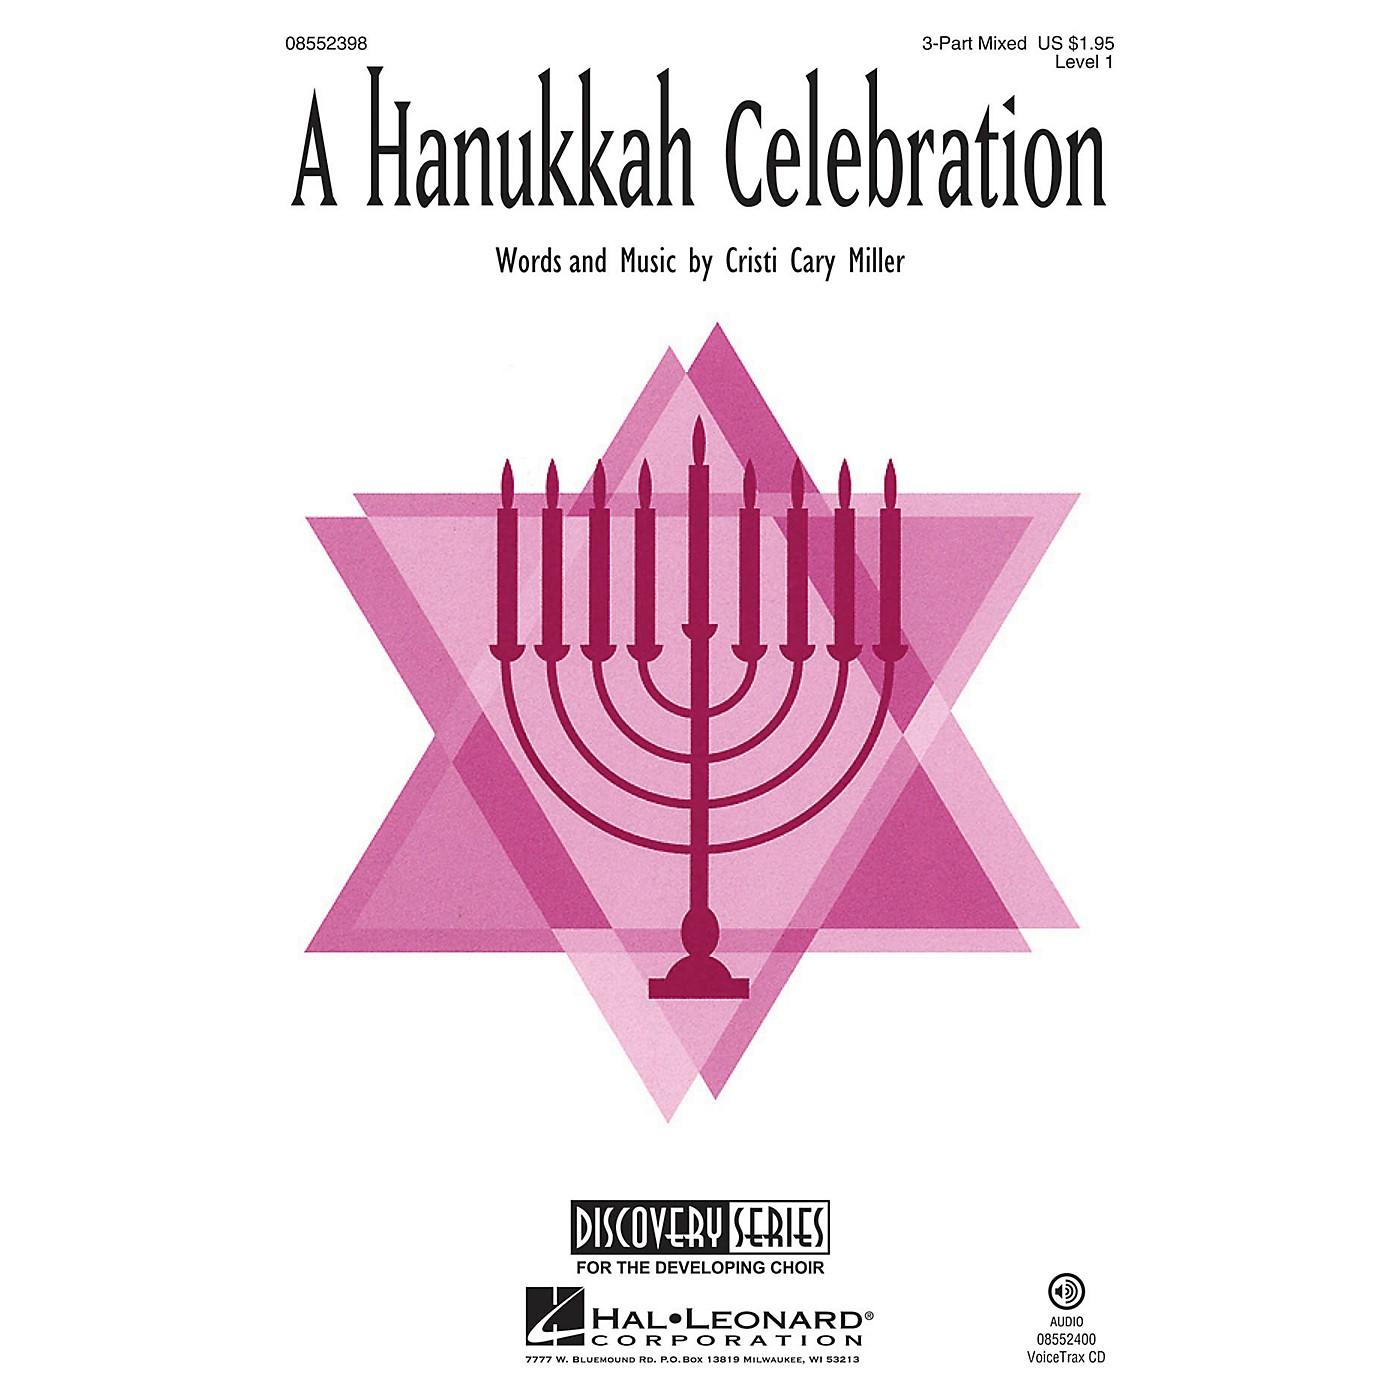 Hal Leonard A Hanukkah Celebration (Discovery Level 1) 3 Part Treble Composed by Cristi Cary Miller thumbnail